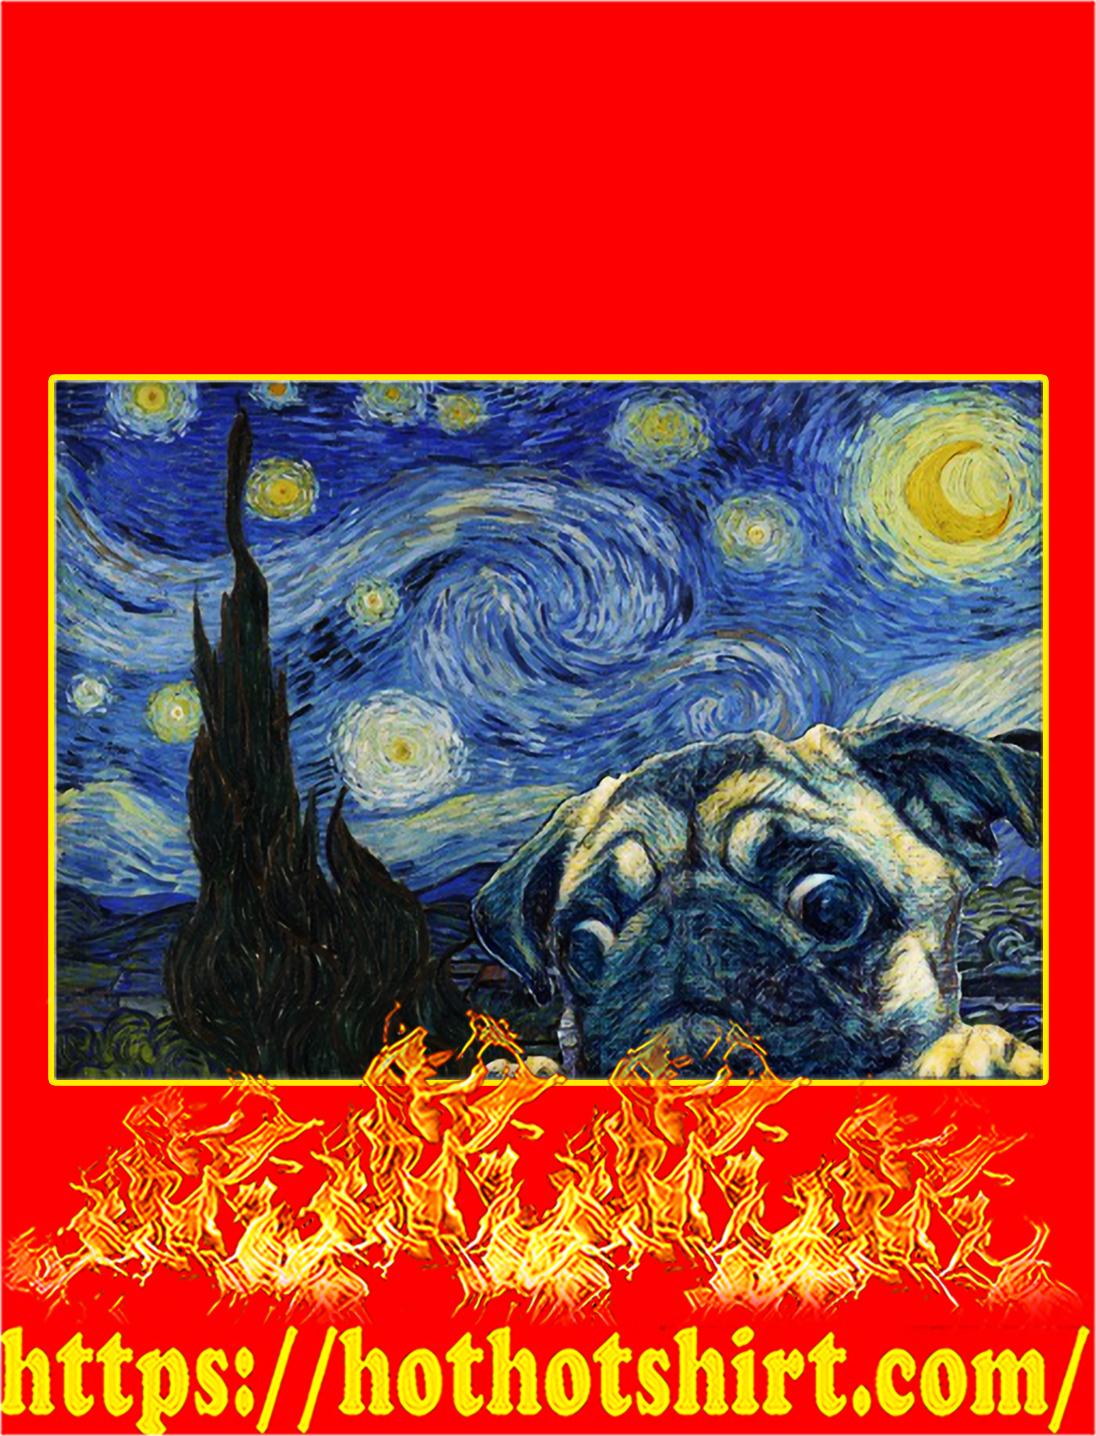 Pug Starry Night Van Gogh Poster - A1